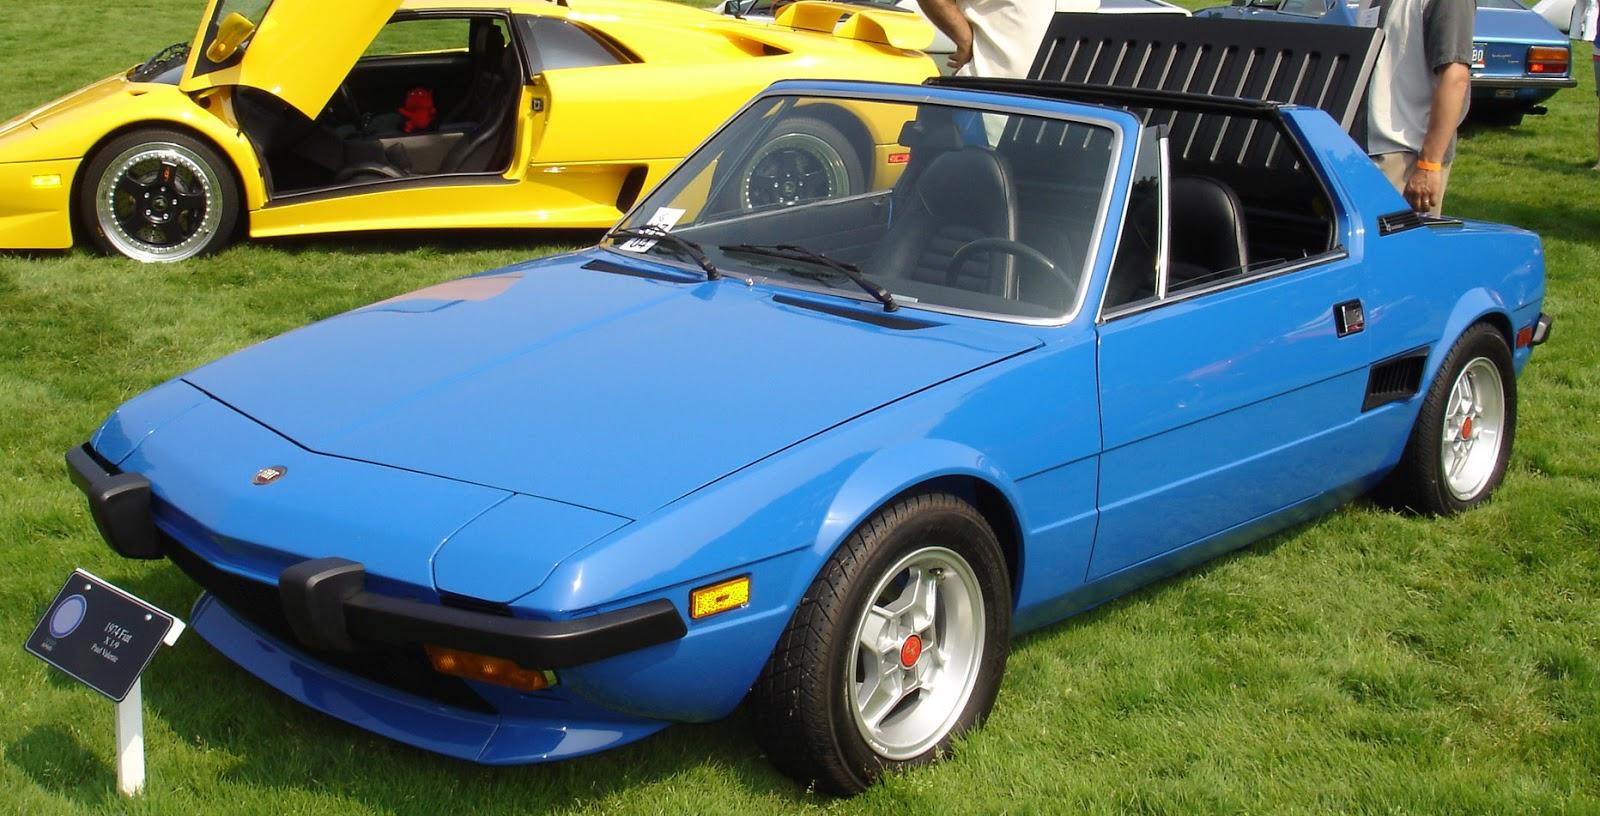 1974 FiatX1.9 Φέρτε πίσω τα pop ups: 12 πάμφθηνα αυτοκίνητα που τα χουν Fiat X1/9, Honda, Lotus, mazda mx-5, Mazda RX-7, Mitsubishi 3000GT, Nissan 200SX, pop ups, Porsche, Toyota, Toyota AE86, Toyota MR2, zblog, μεταχειρισμένα, φανάρια ανακλινόμενα